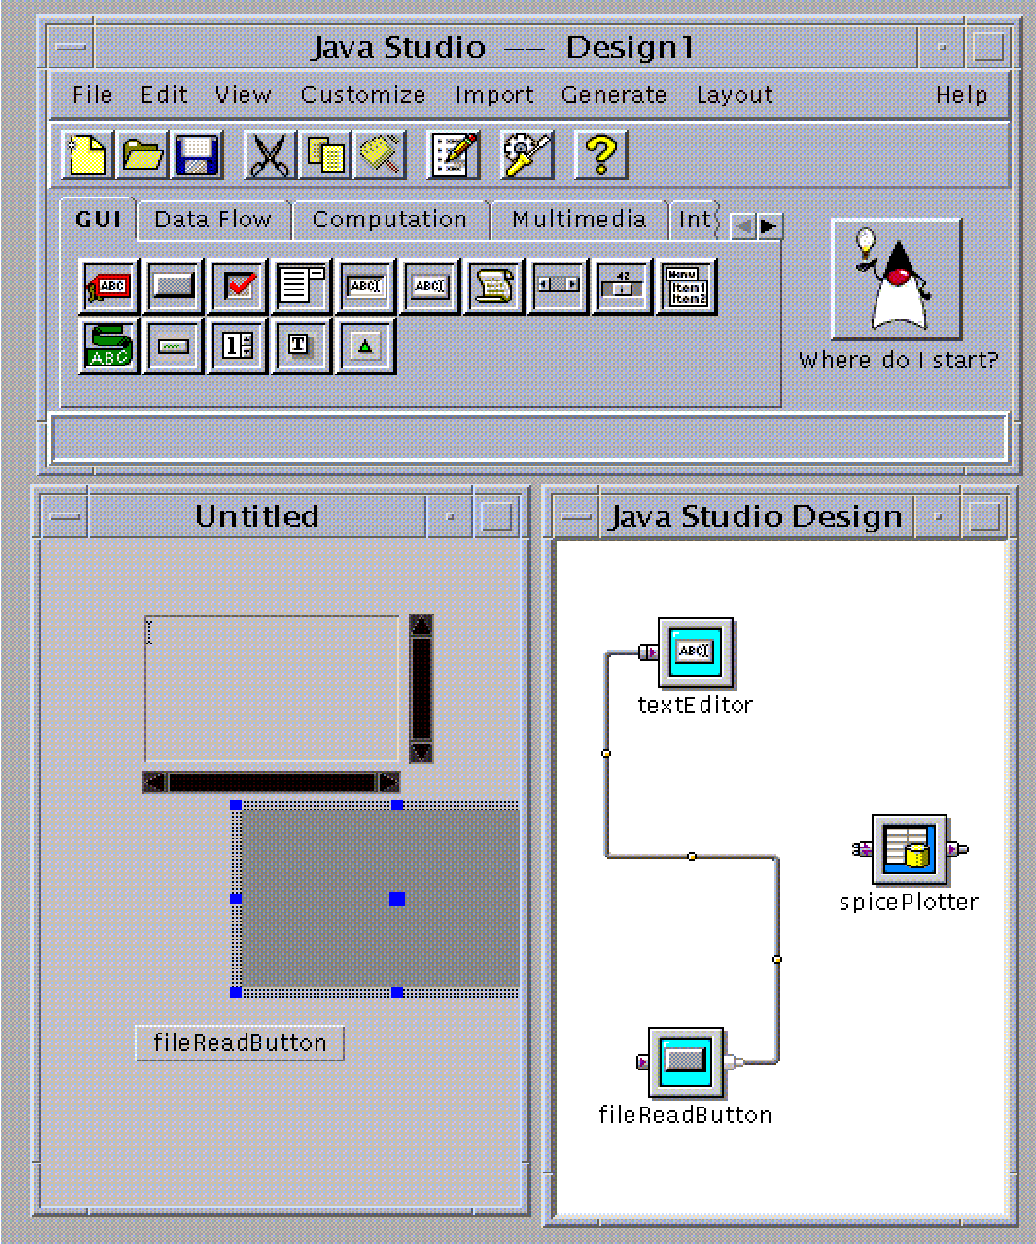 Figure 4: Use of JavaStudio Bean Development Environment in JSPICE client.